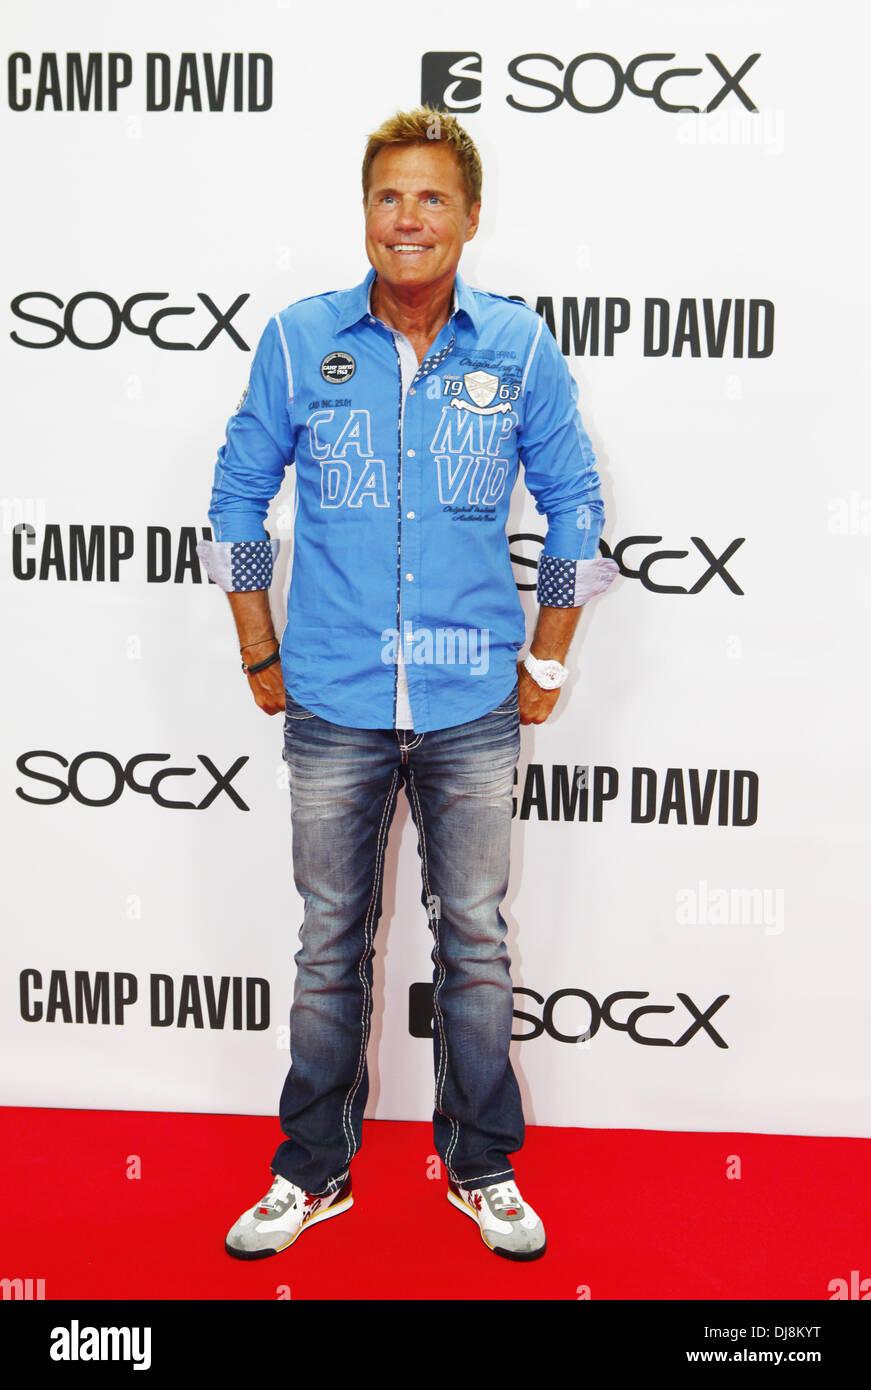 best website 74d26 3f2b2 Dieter Bohlen at the Camp David/Soccx fashion show during ...